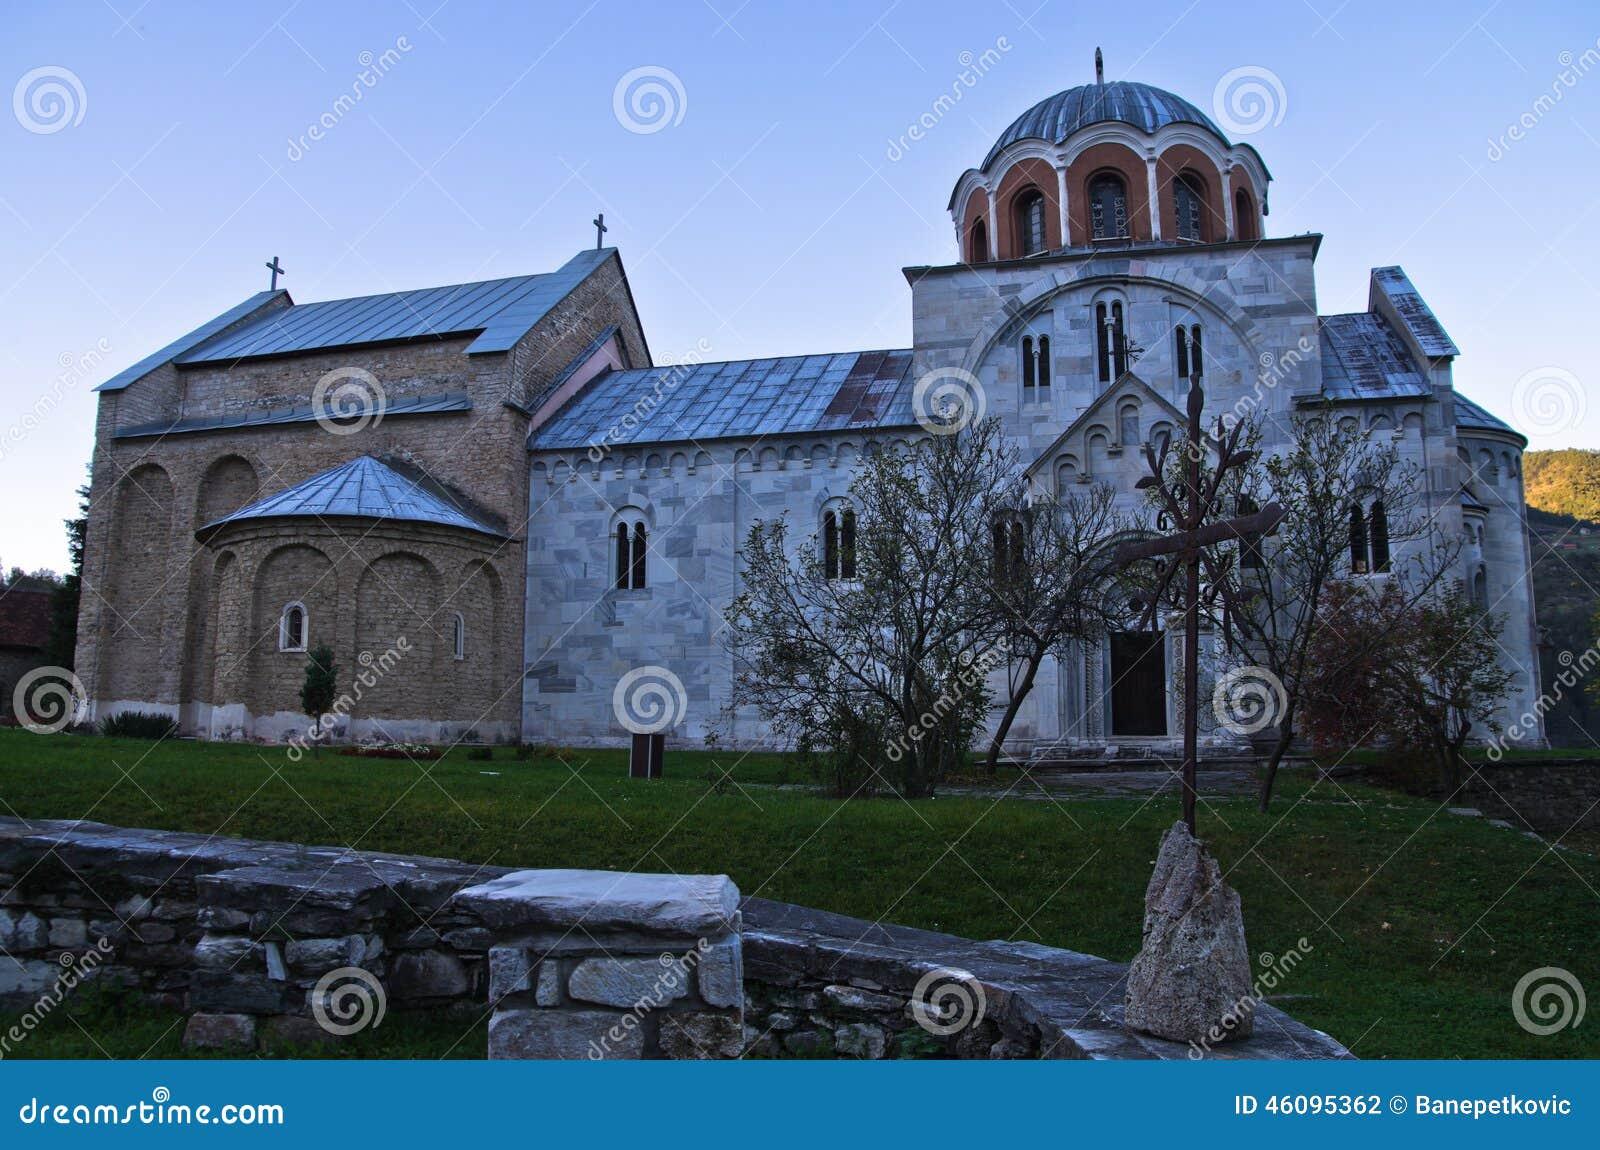 Белая мраморная церковь от 12 столетие внутри монастыря Studenica на заходе солнца